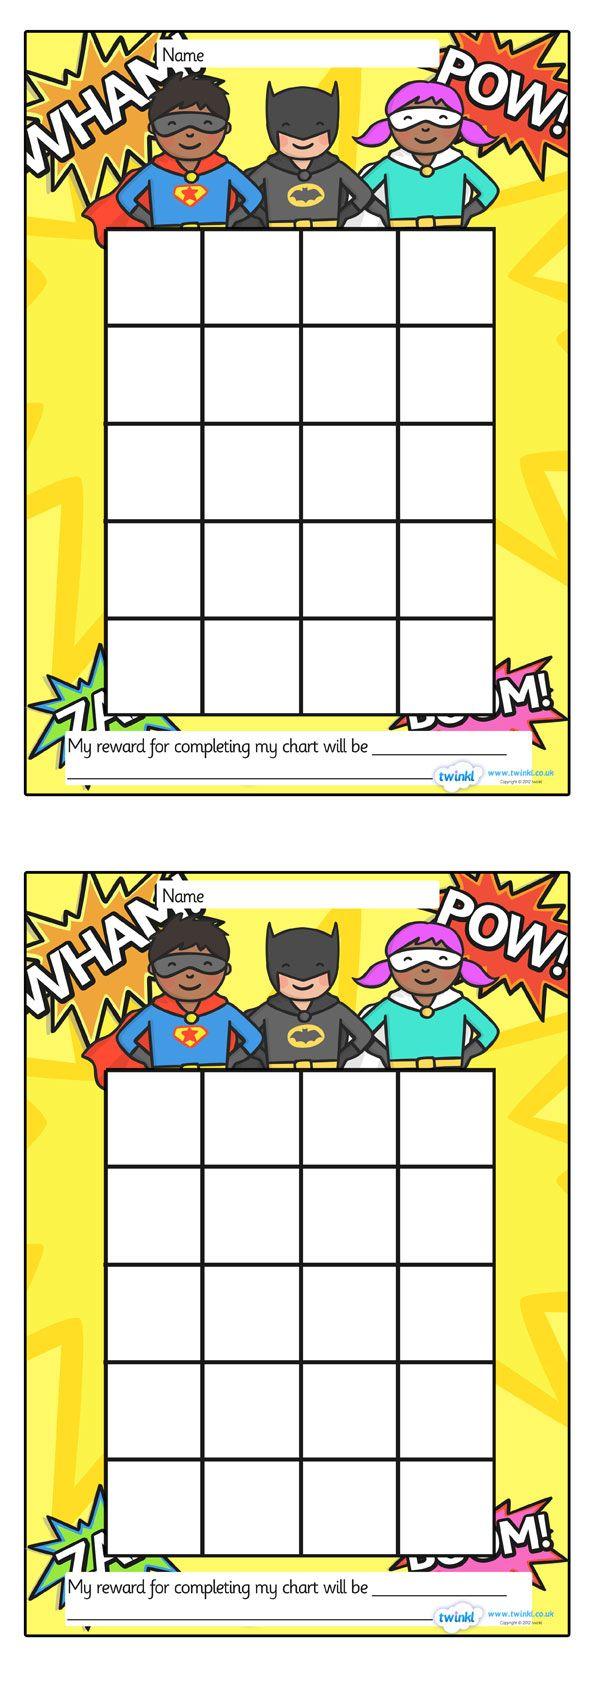 Twinkl Resources U003eu003e Superhero StickerStamp Reward Chart  30c6fa8d789cca349ecca224a722935b 37154765648794255. Free Printable Reward  Charts For Teachers  Blank Sticker Chart